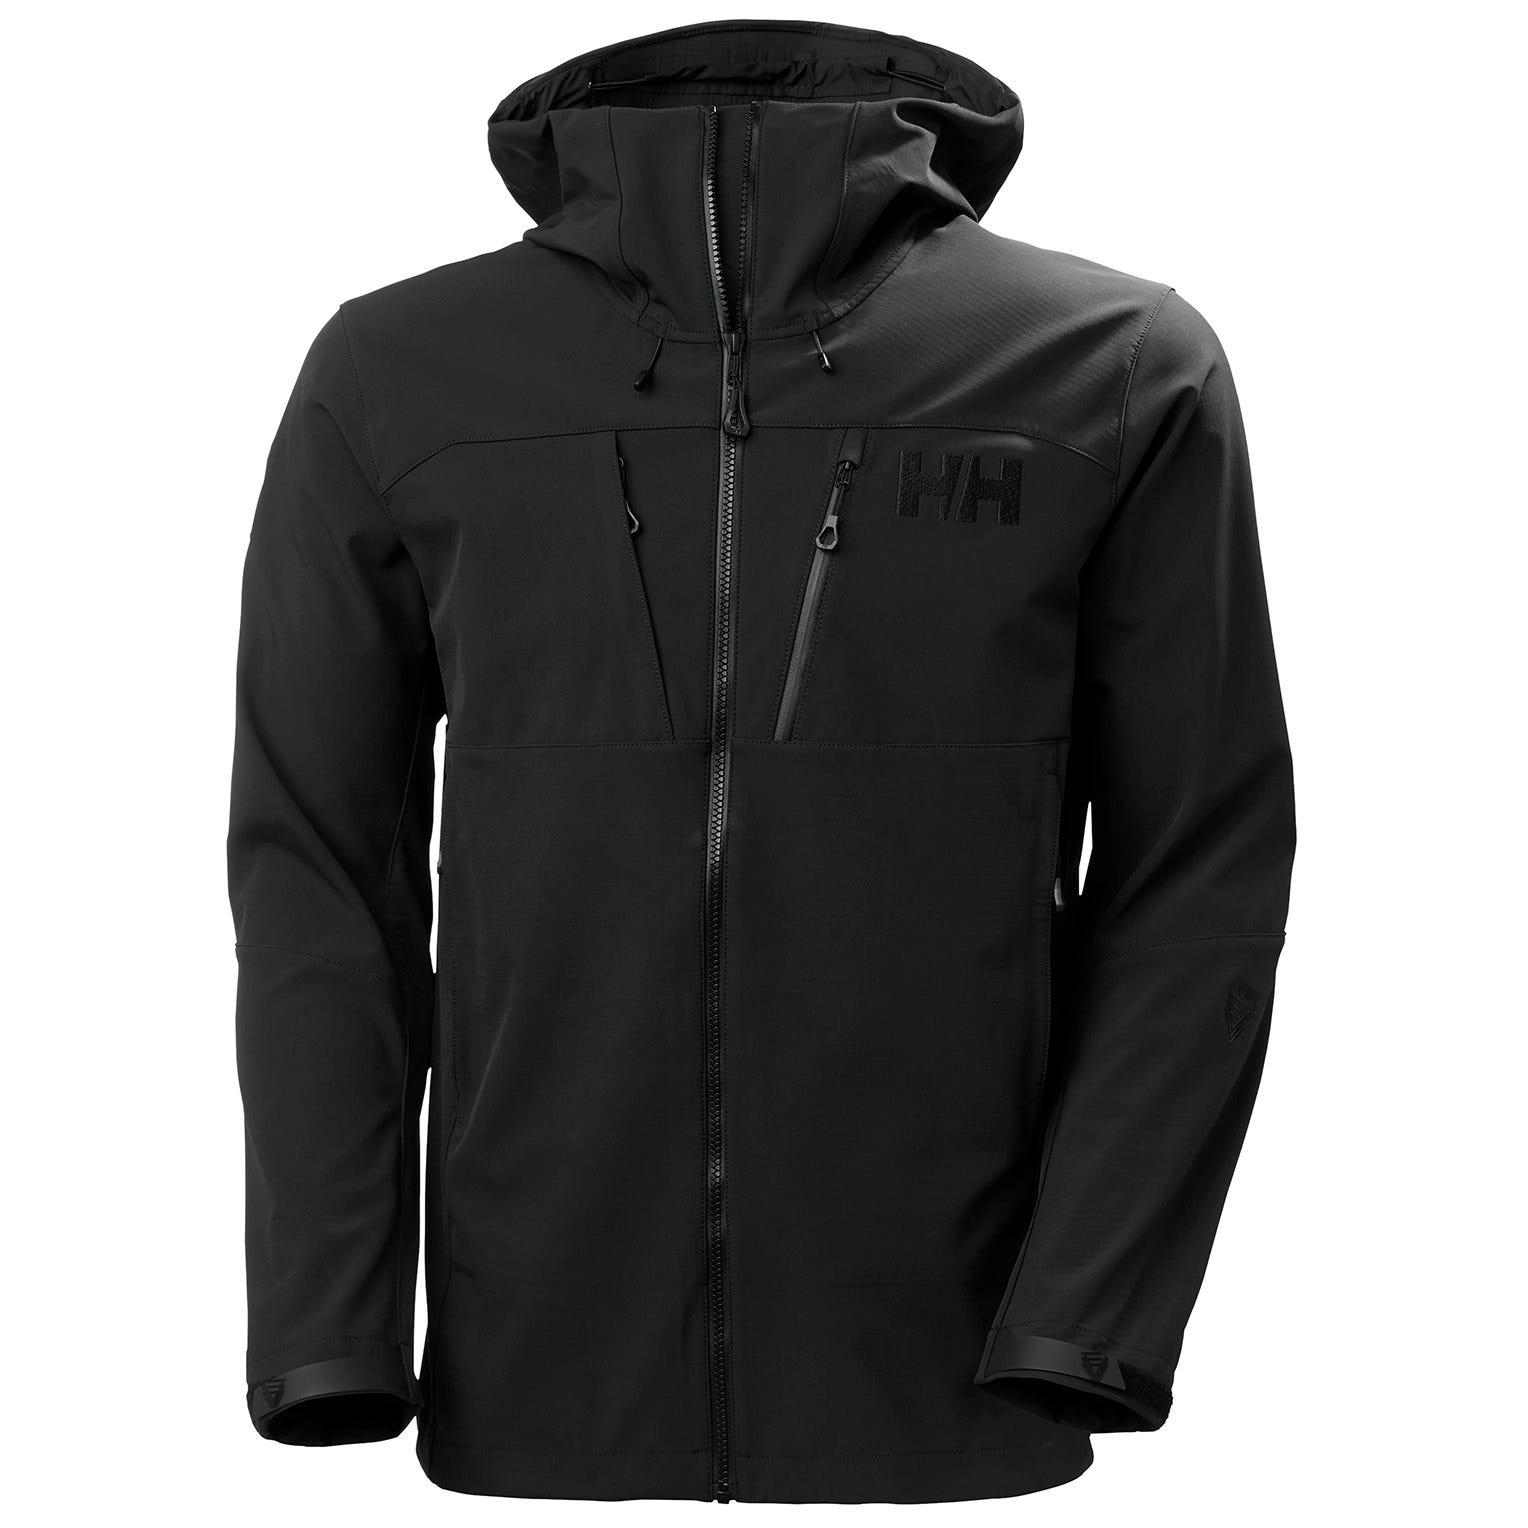 Helly Hansen Mens Odin Mountain Hybrid Softshell Jacket Black M